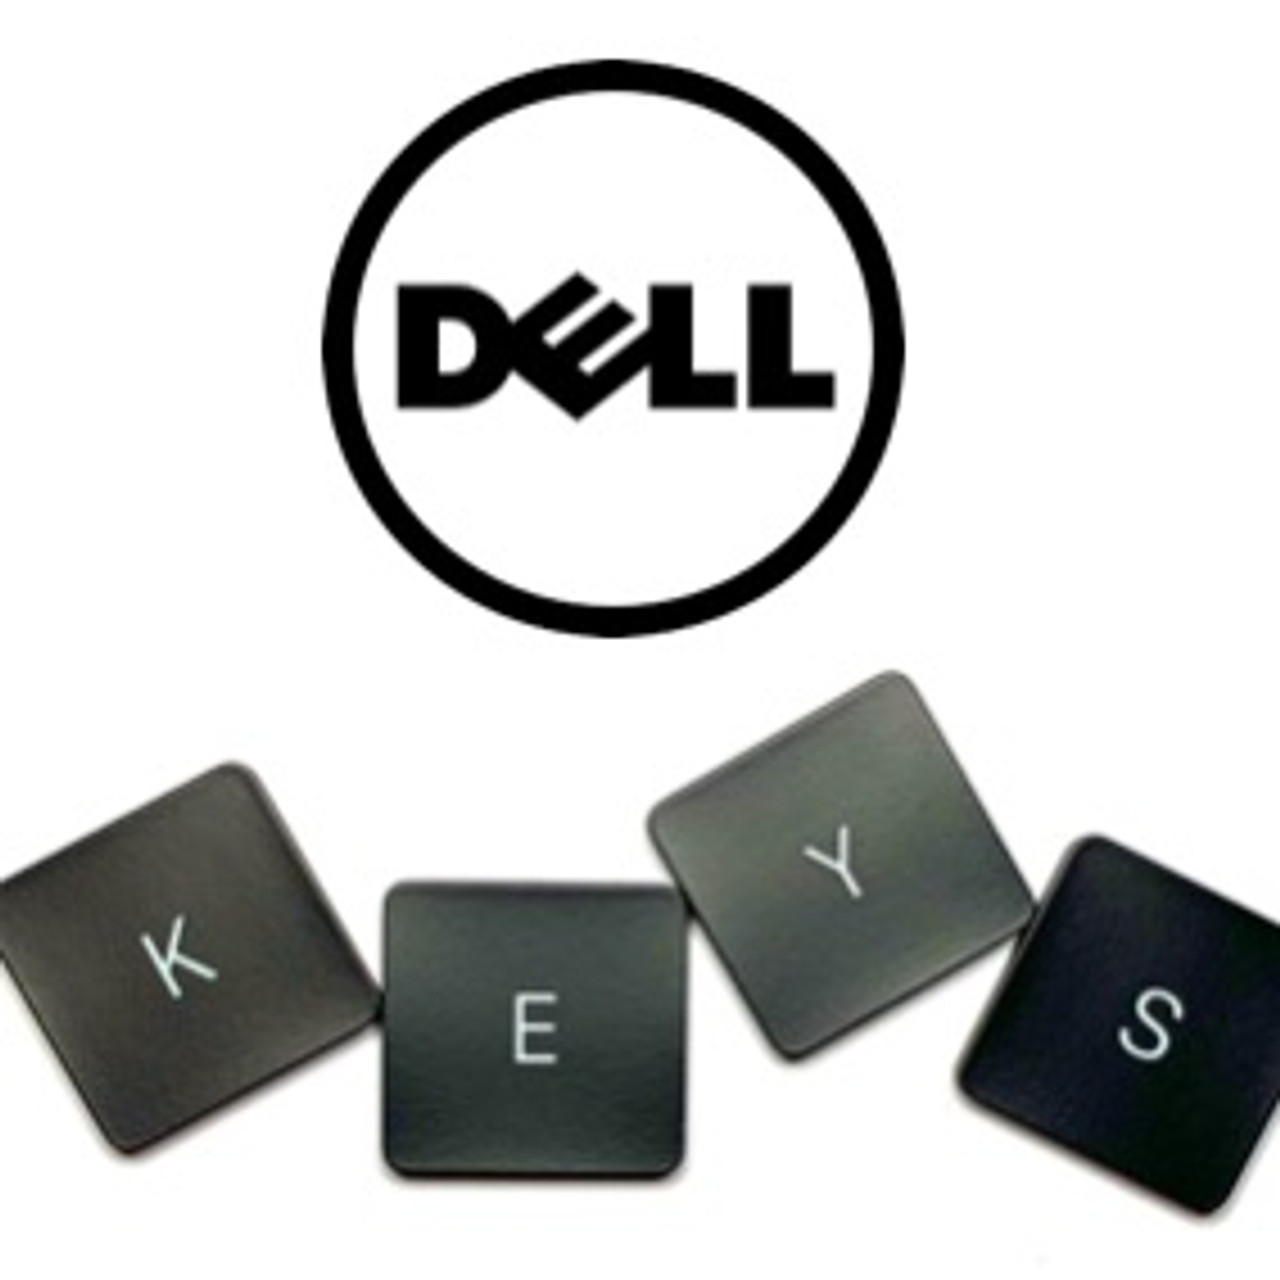 Dell Latitude E6440 Laptop Keyboard Key Replacement